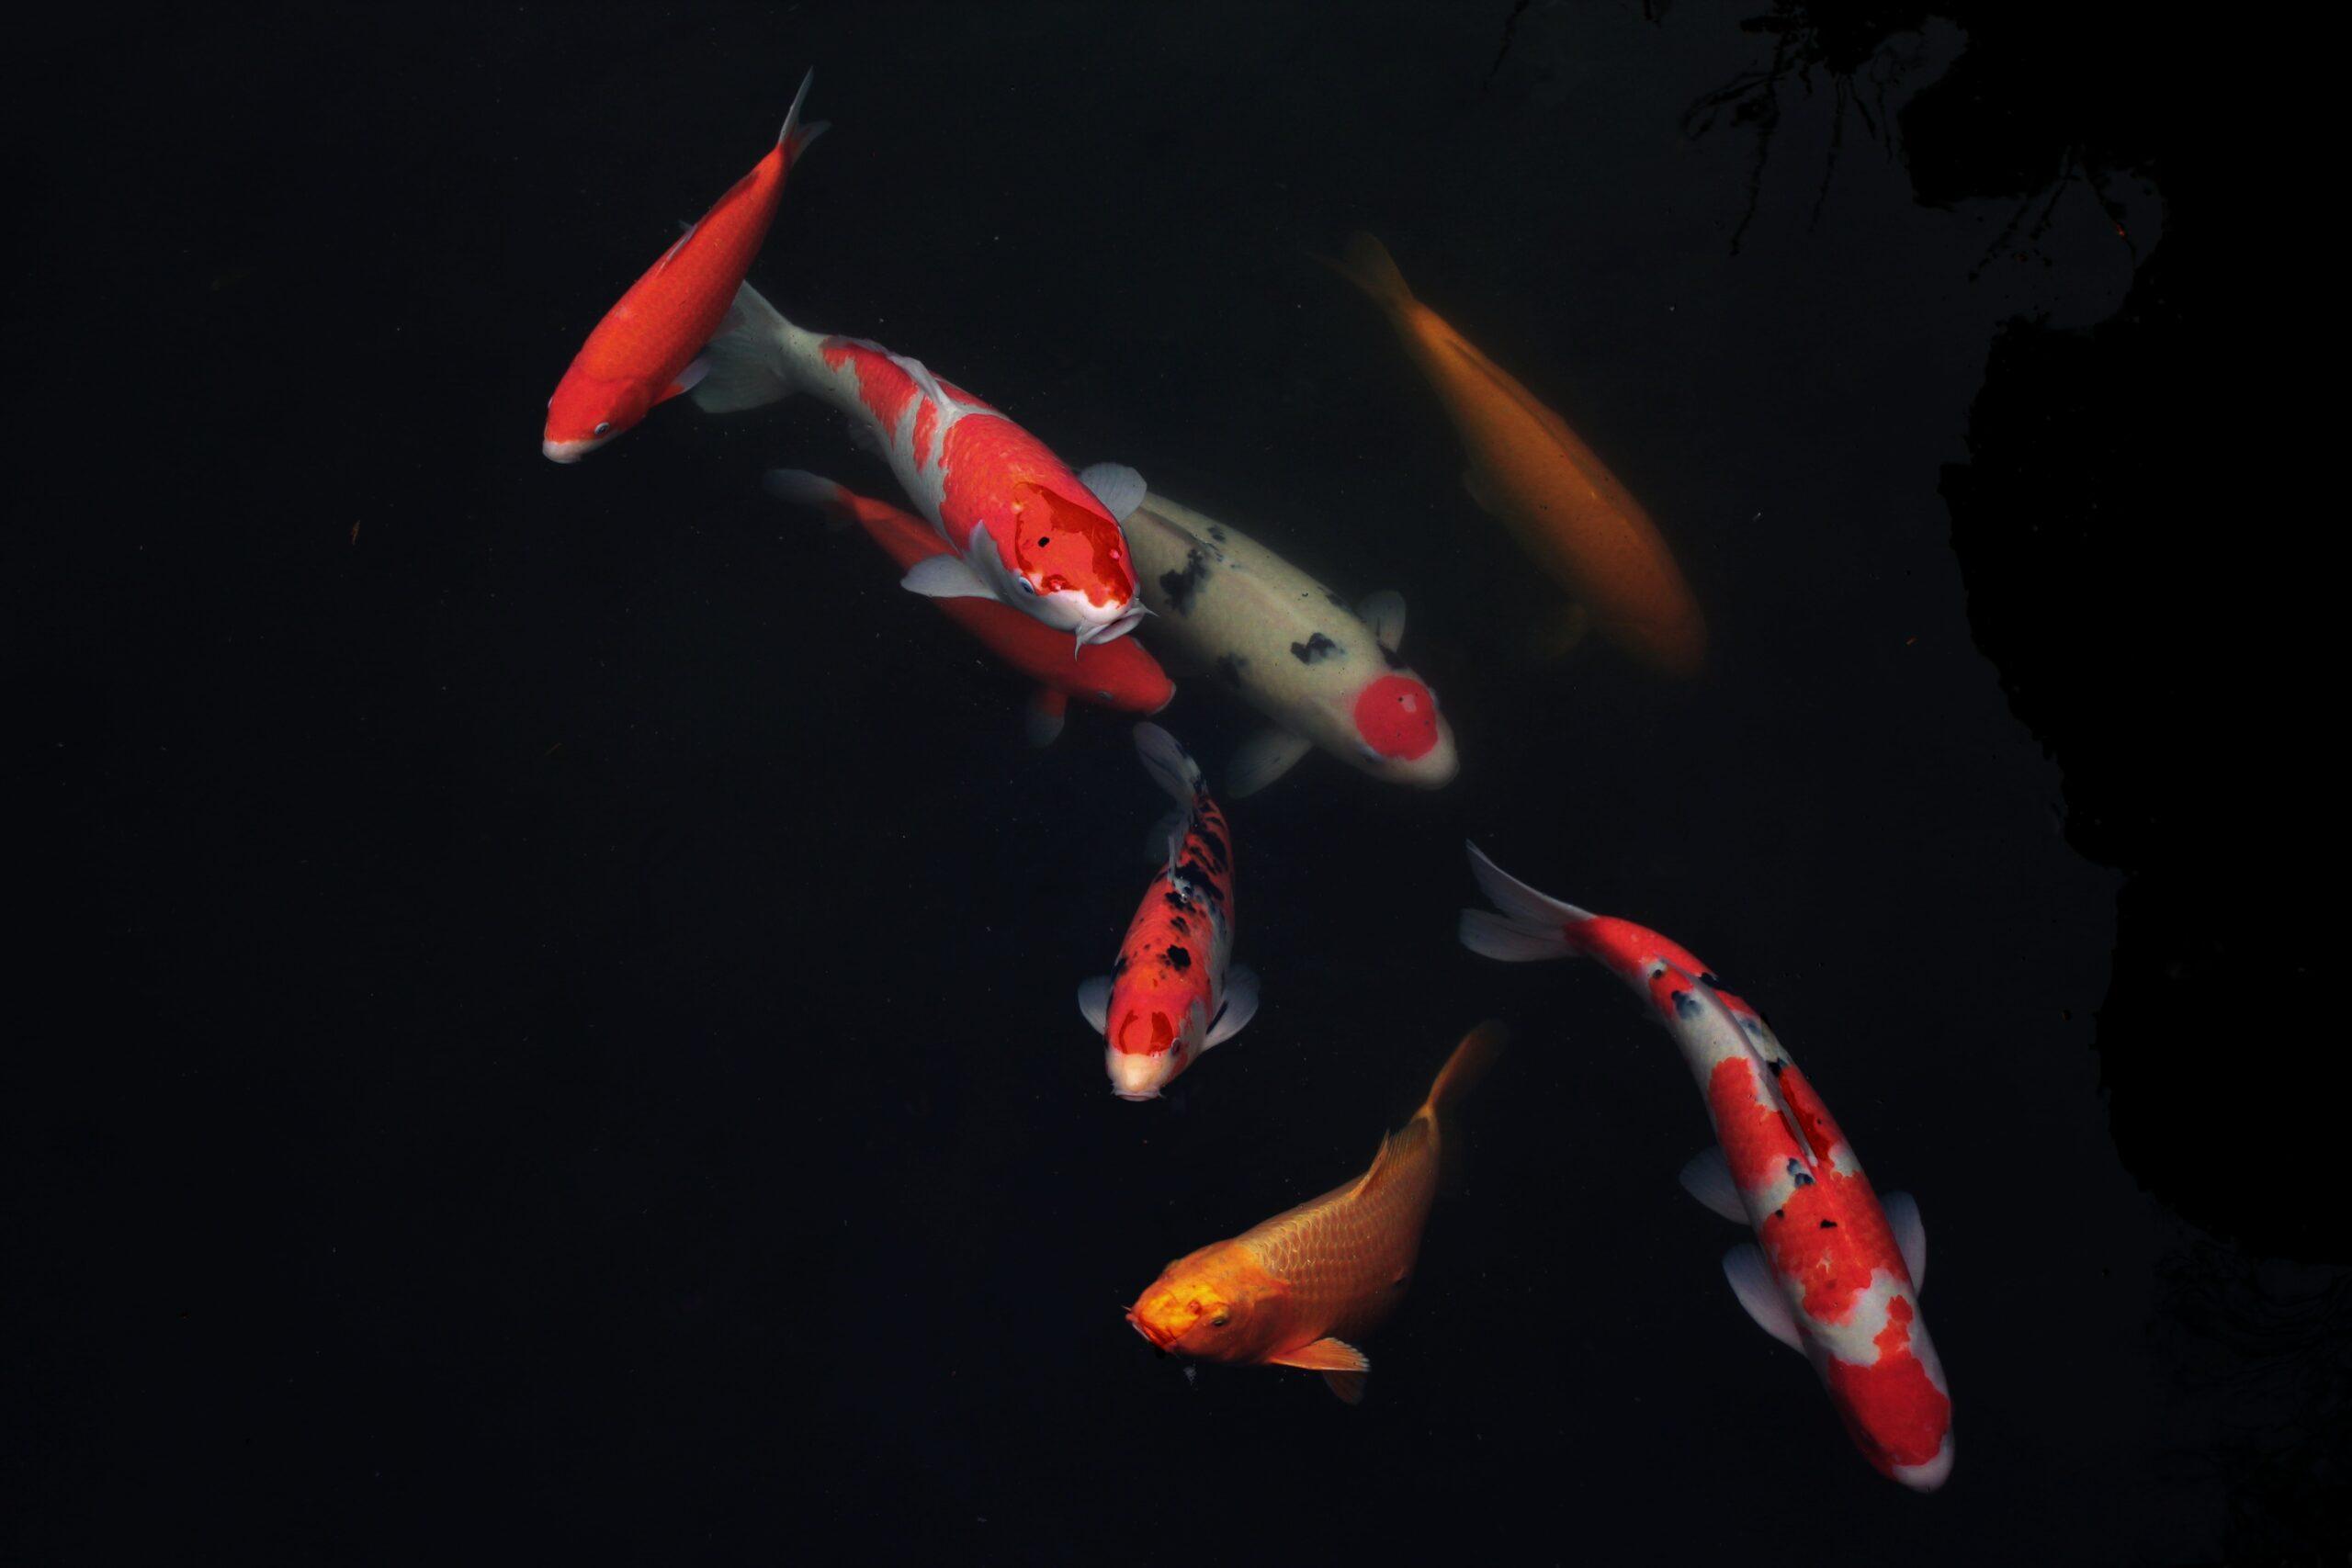 tifenn-degornet-Large Japanese Koi fish in pond-unsplash